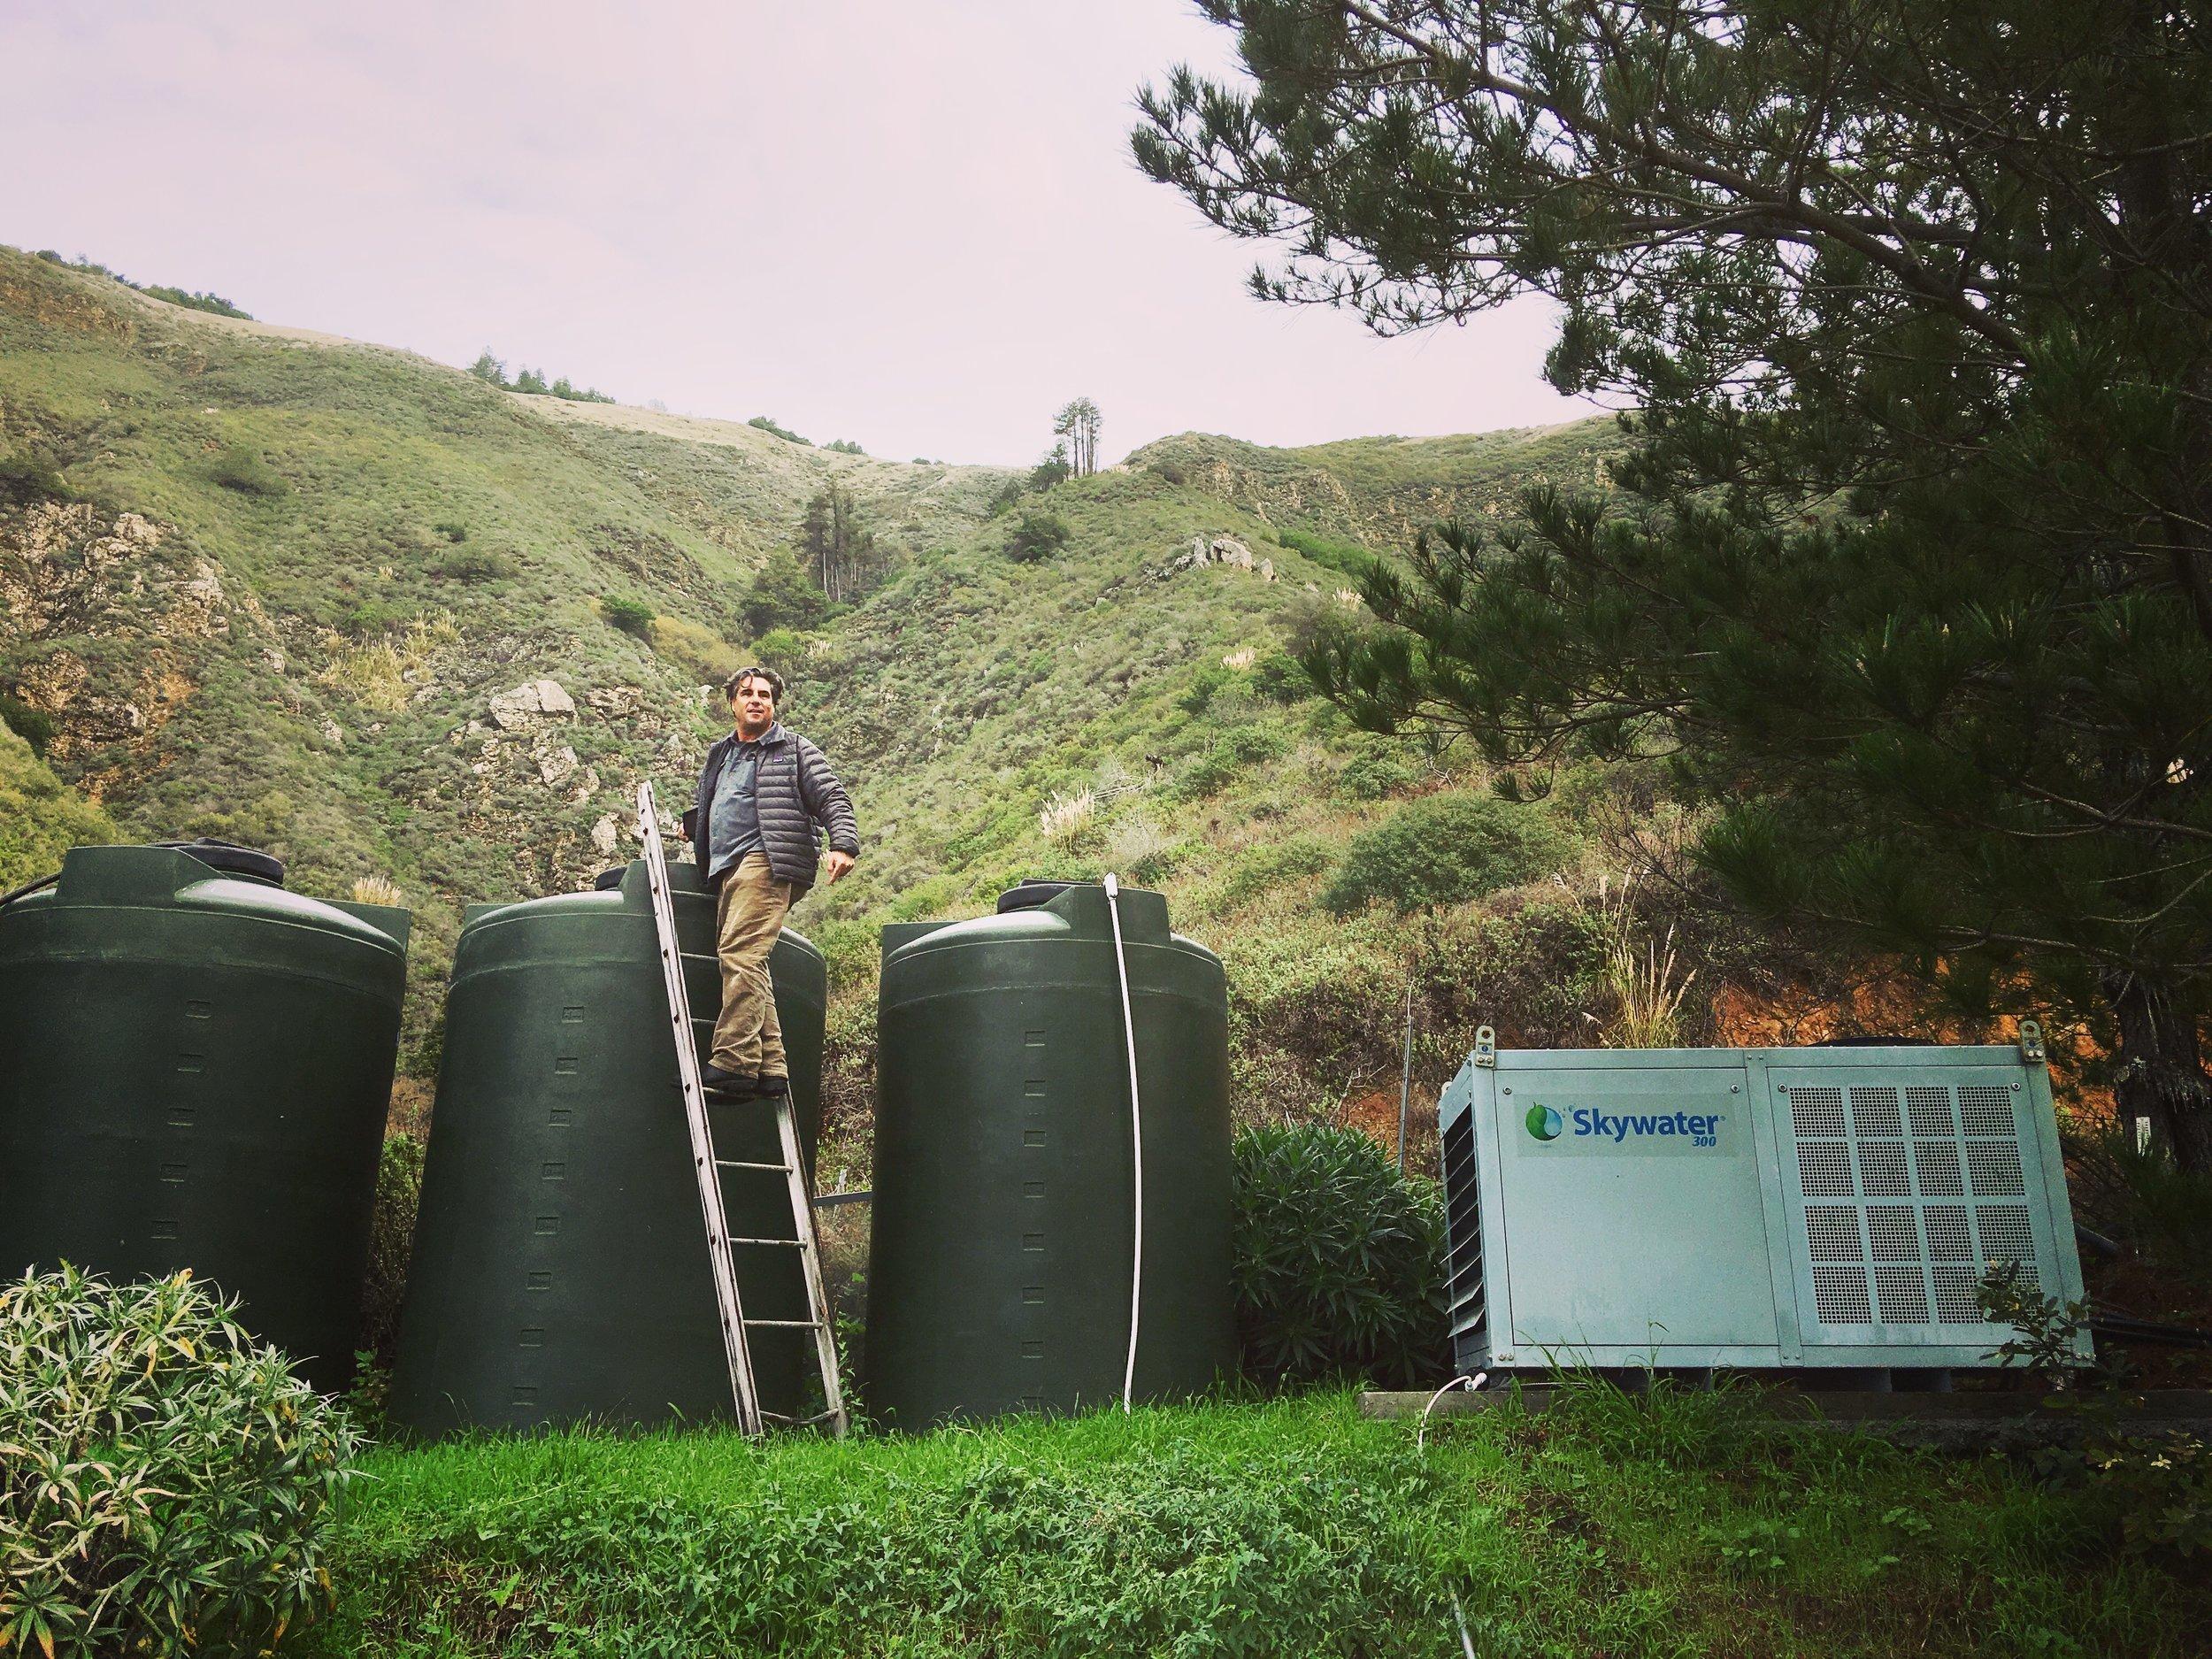 myCleantechFreshWater™ - Fresh water from air - Trinkwasser aus der Luft ab... K20181109-04-D10 Let's developp your renewable project togheter